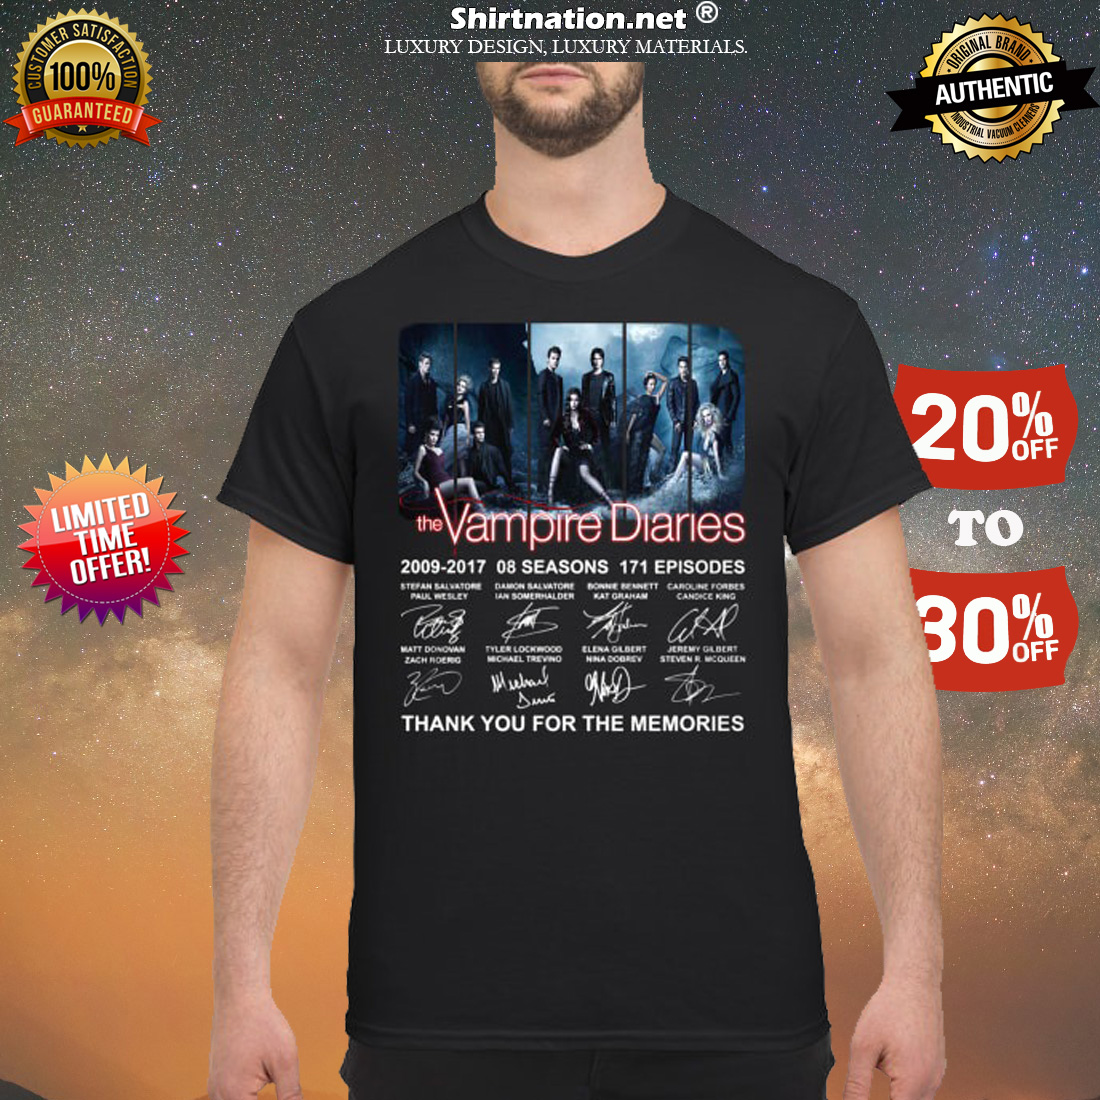 The Vampire Diaries 2009 2017 08 seasons 171 episodes shirt